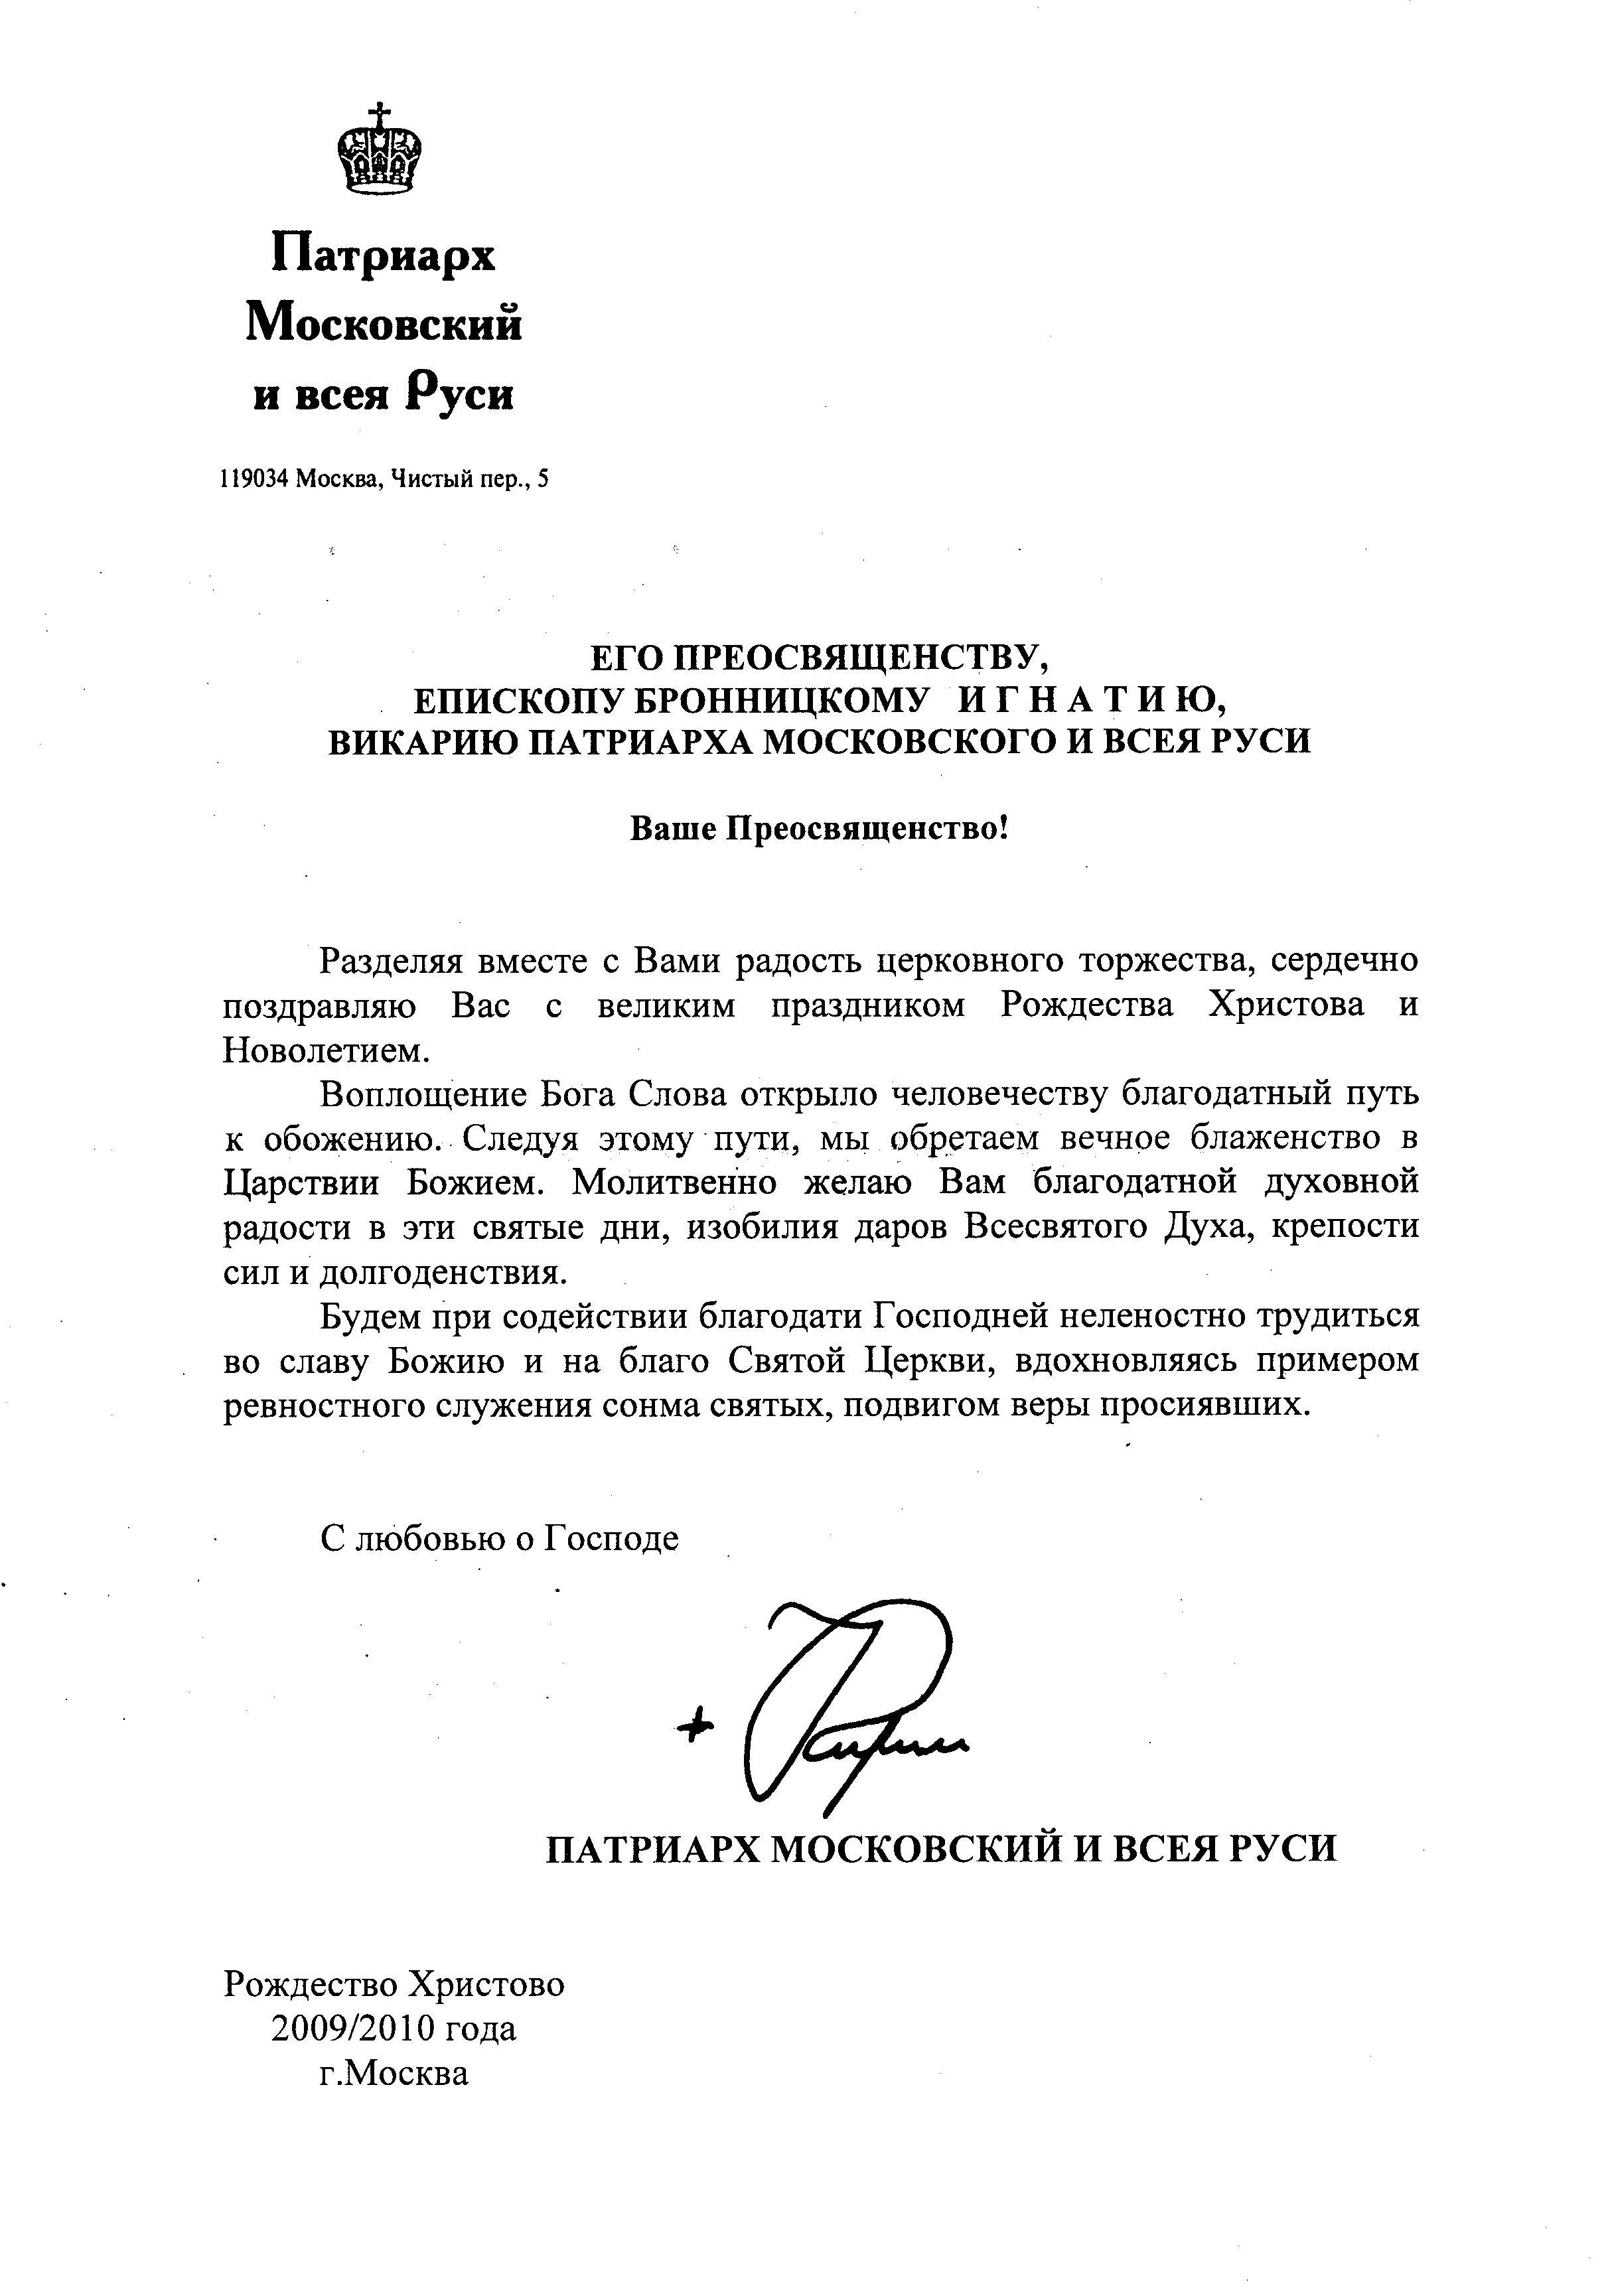 Патриарх / Патриархия. ru